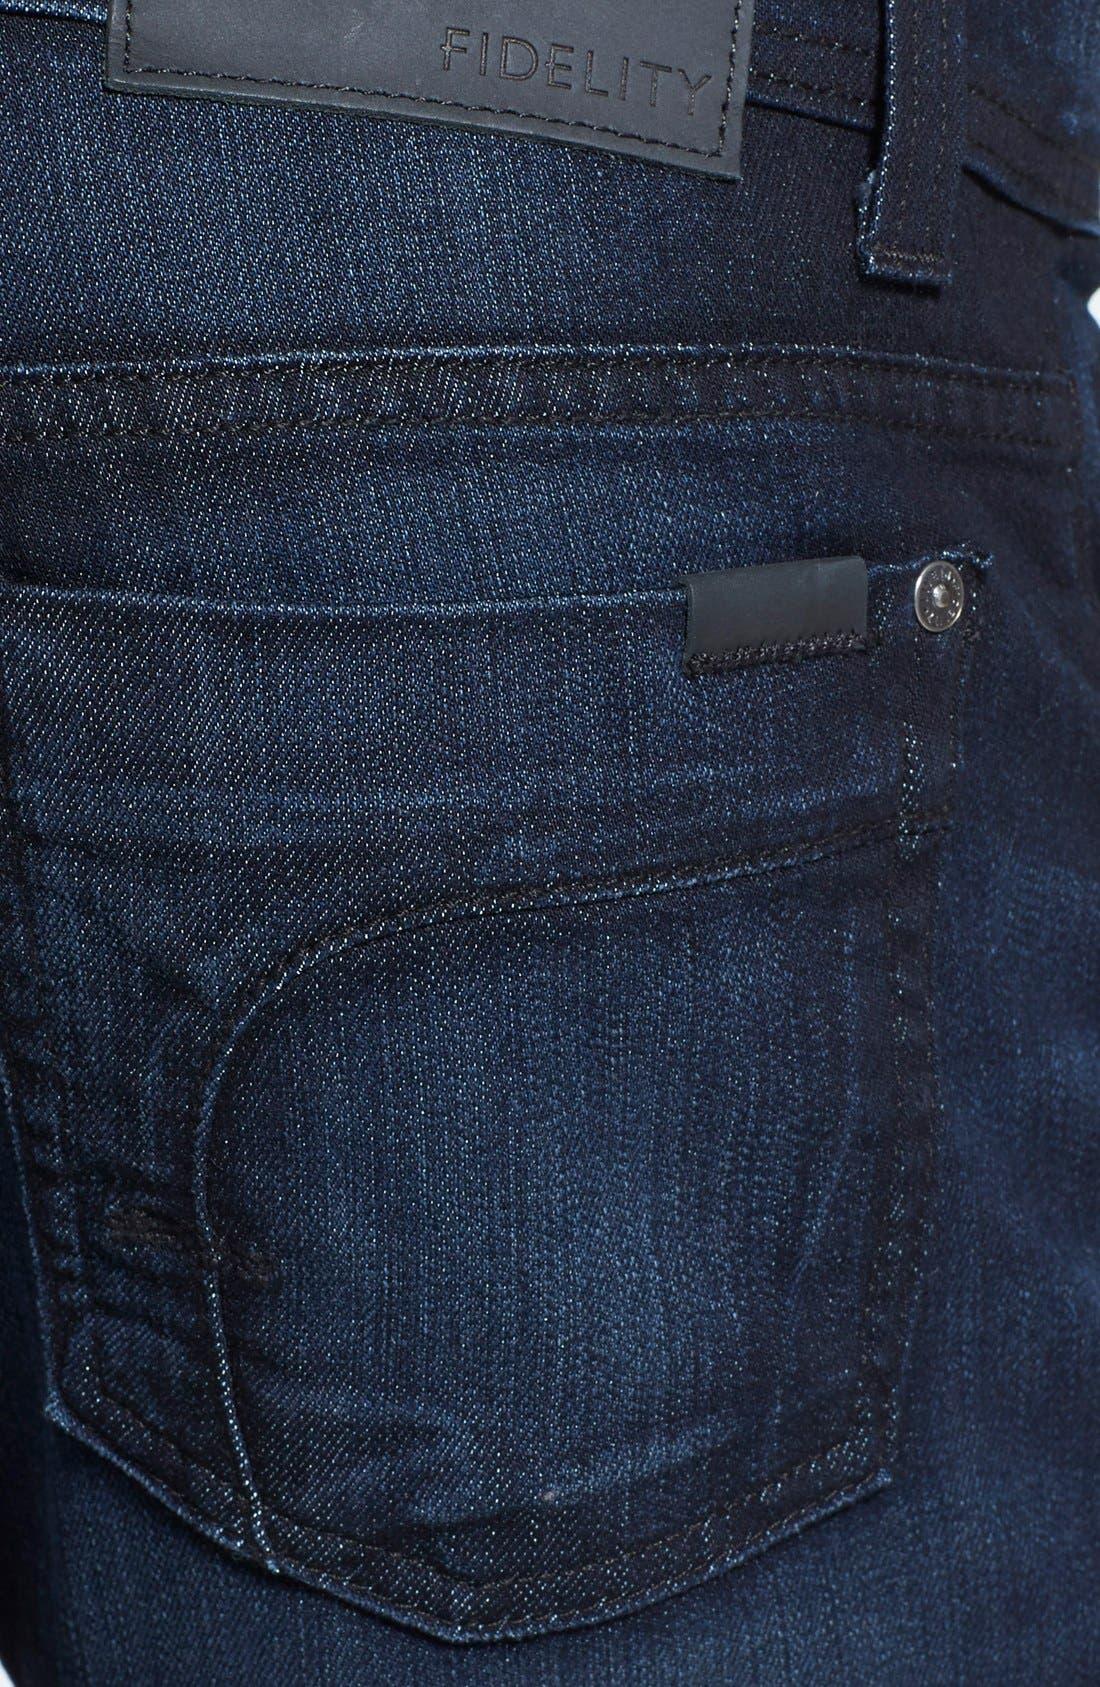 Alternate Image 4  - Fidelity Denim 'Jimmy' Slim Straight Leg Jeans (Blue/Black)